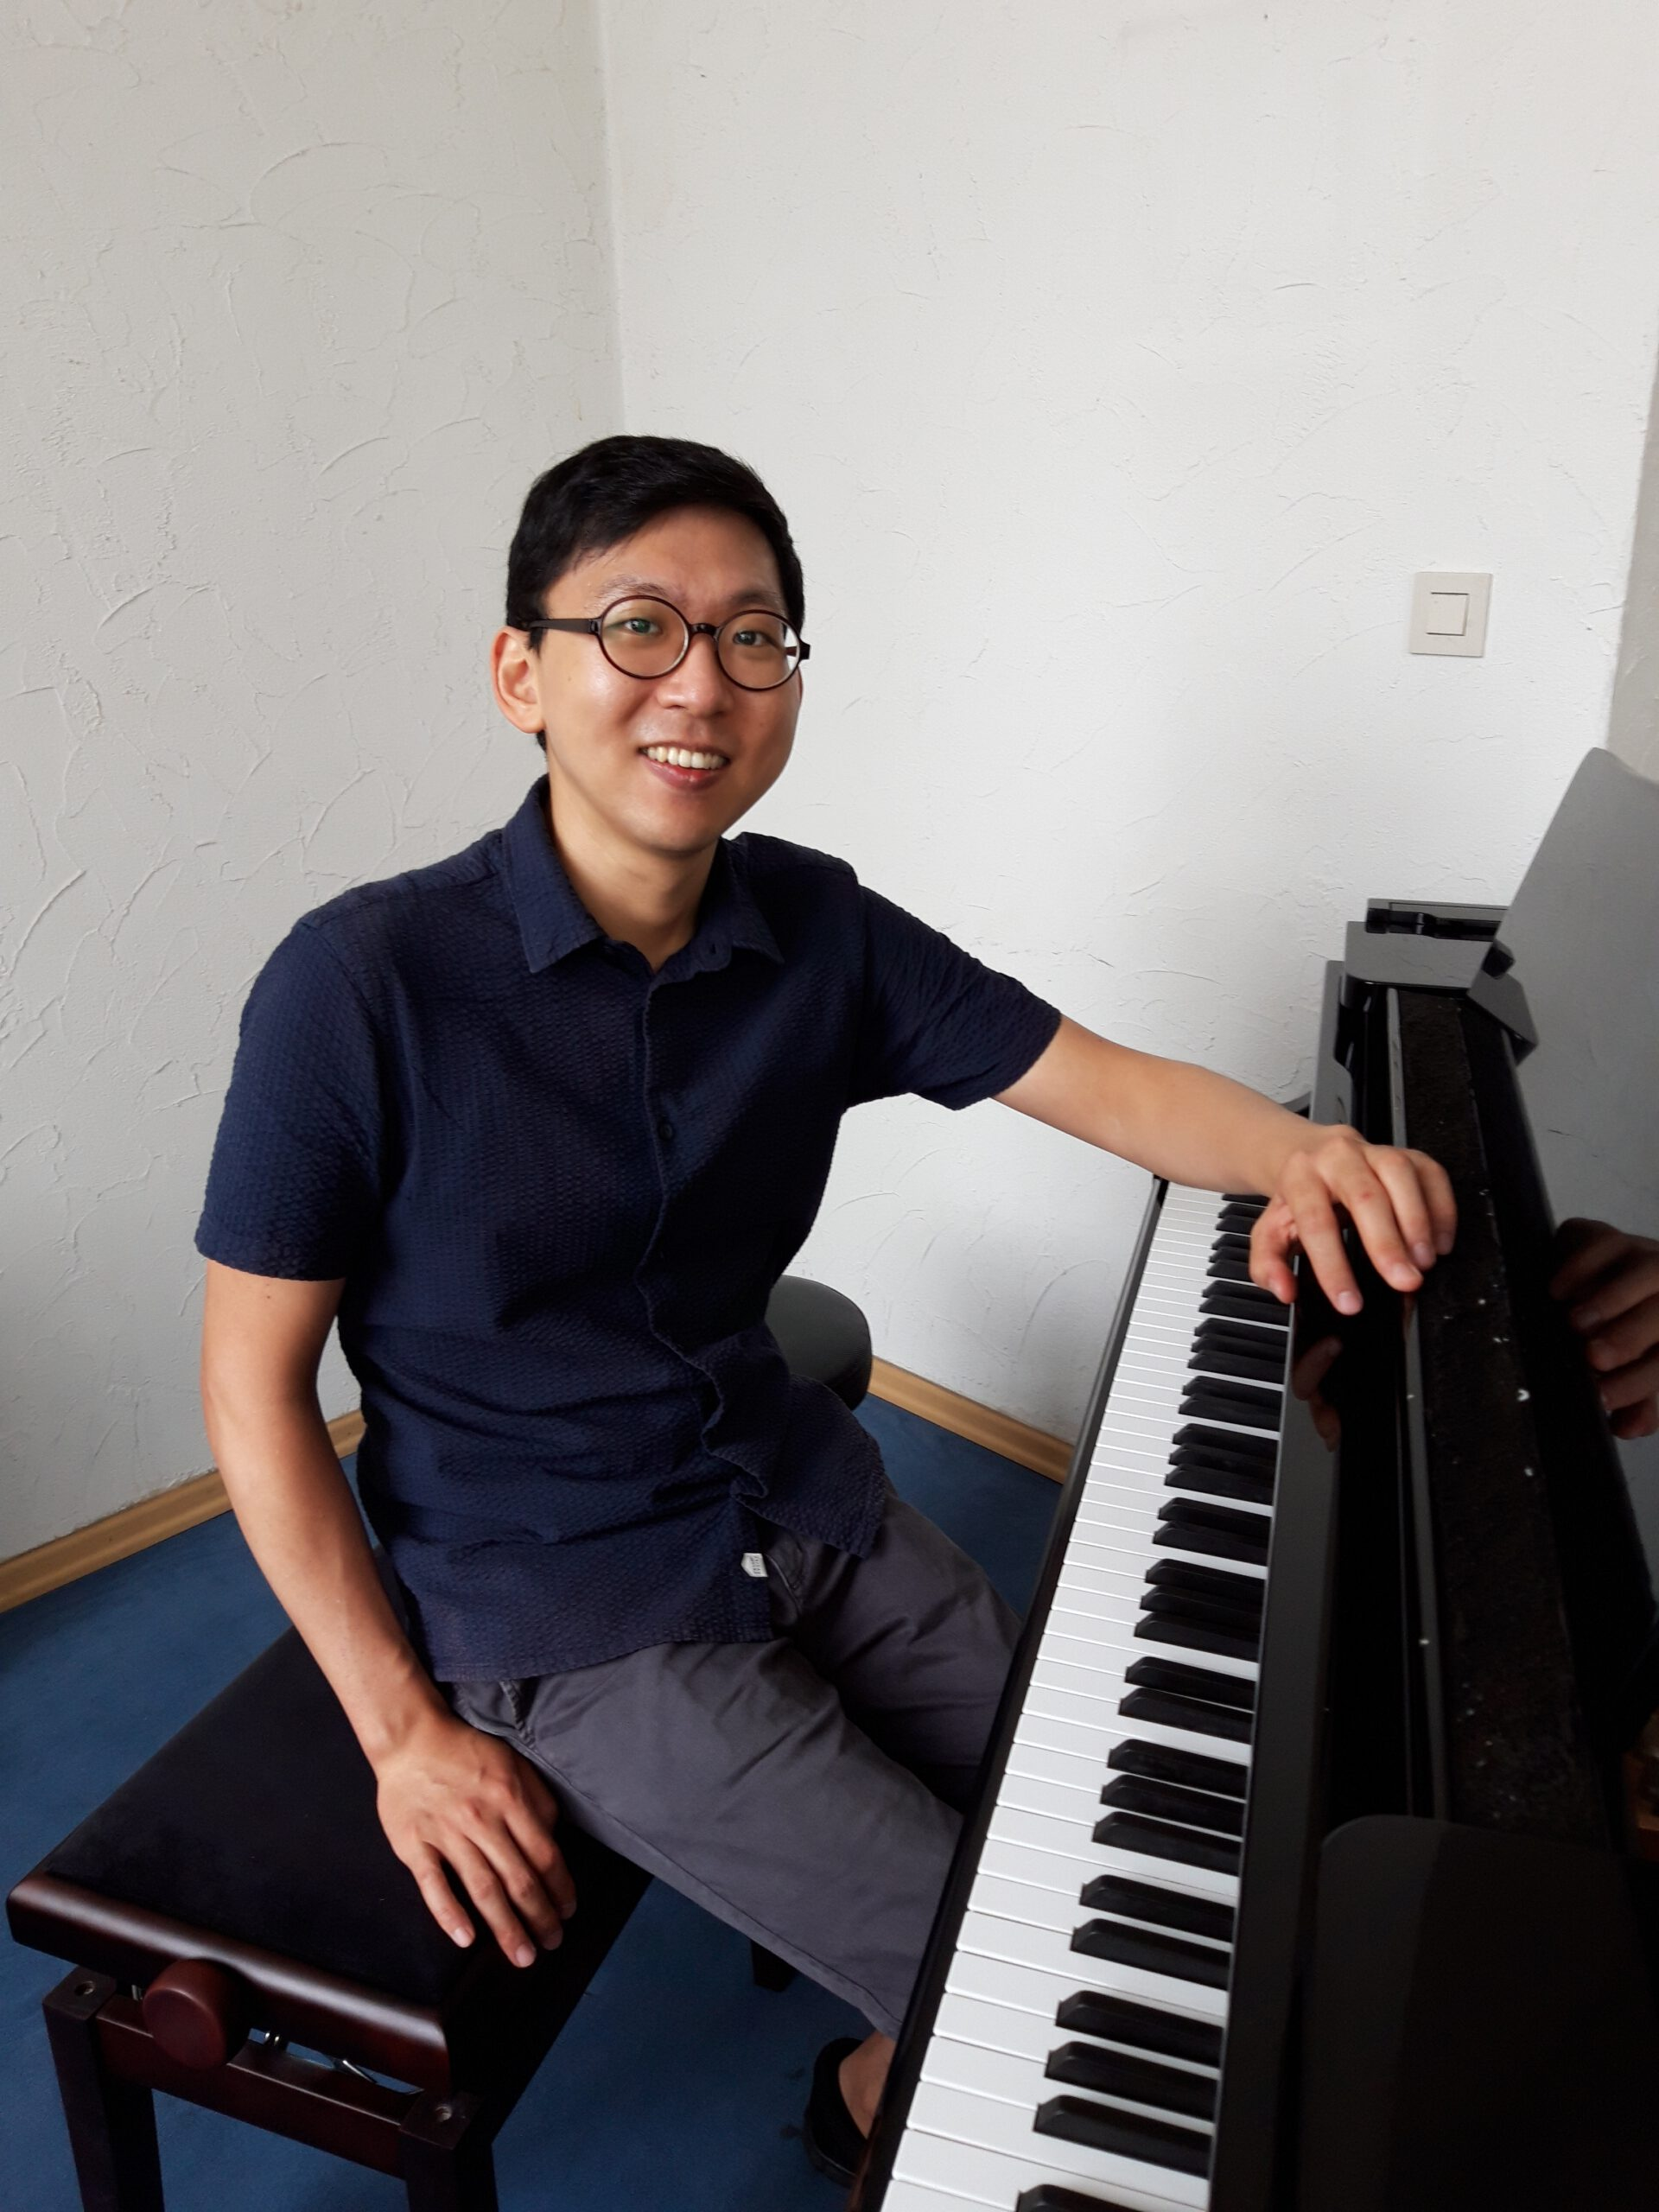 Klavierdozent Daehee Kim